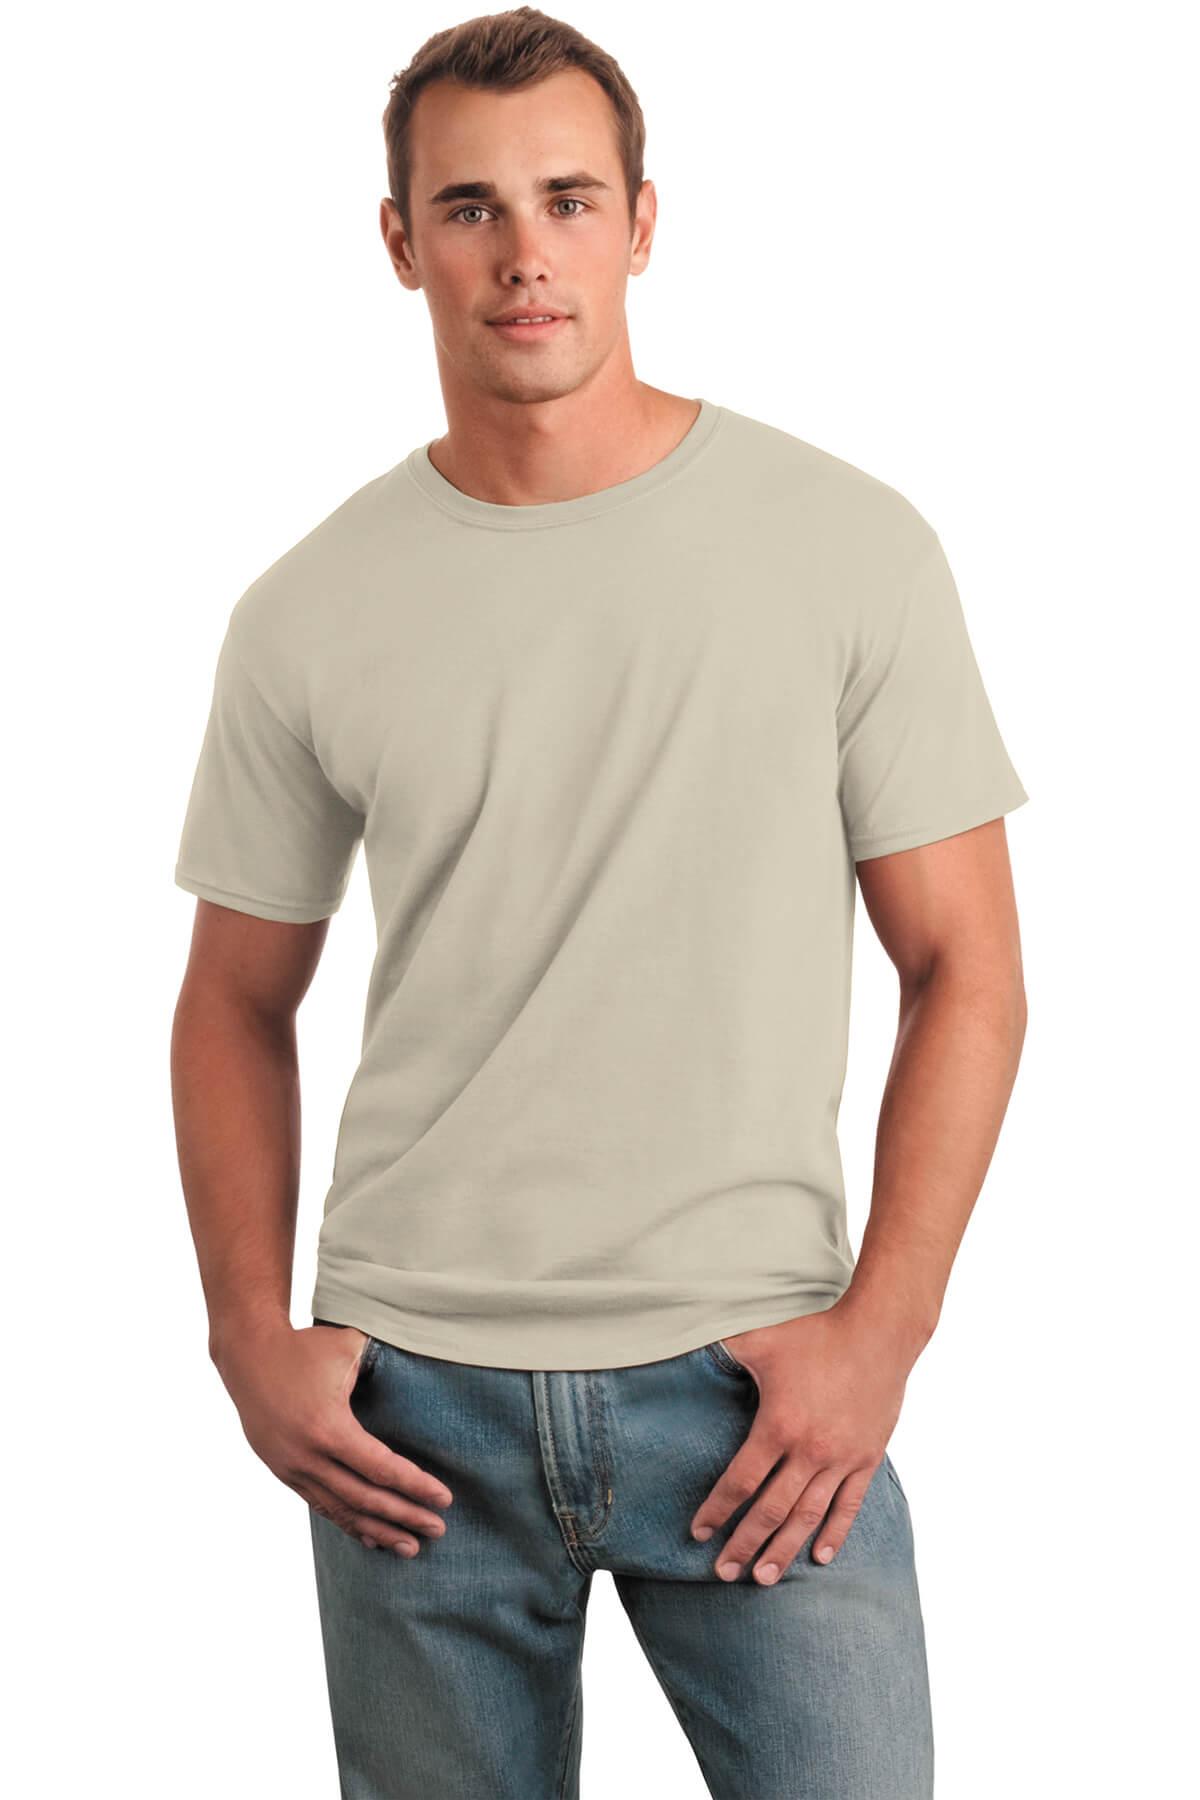 Sand T-Shirt Model Front